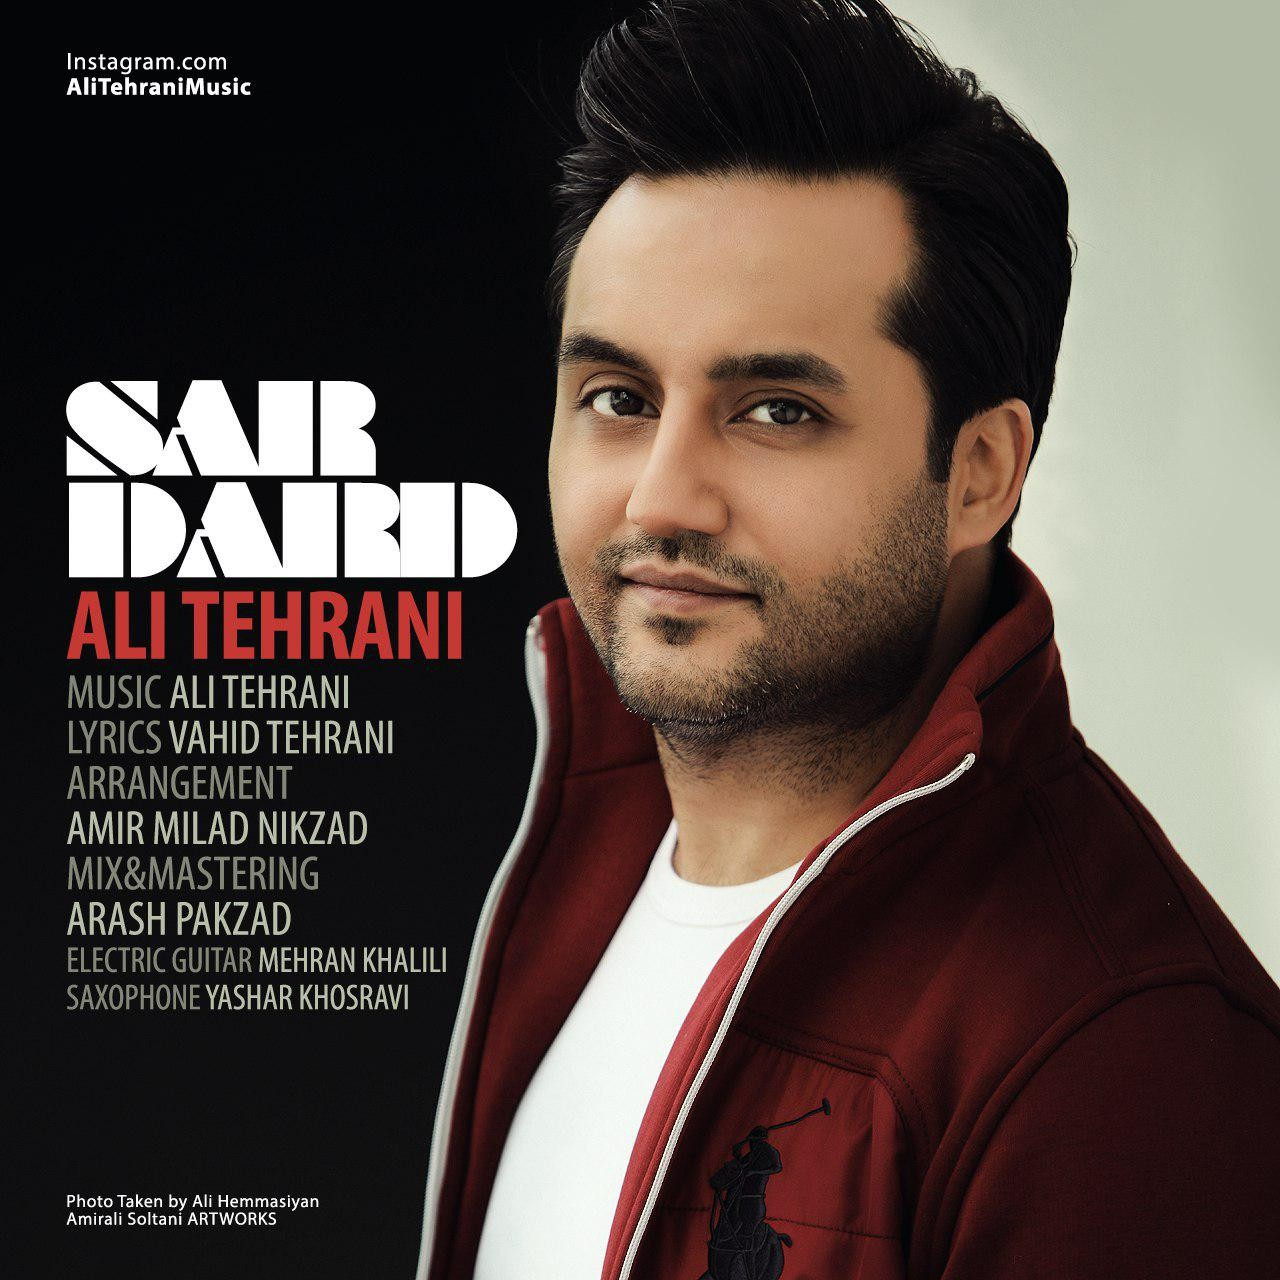 erfan musicfa co page of  ali tehrani